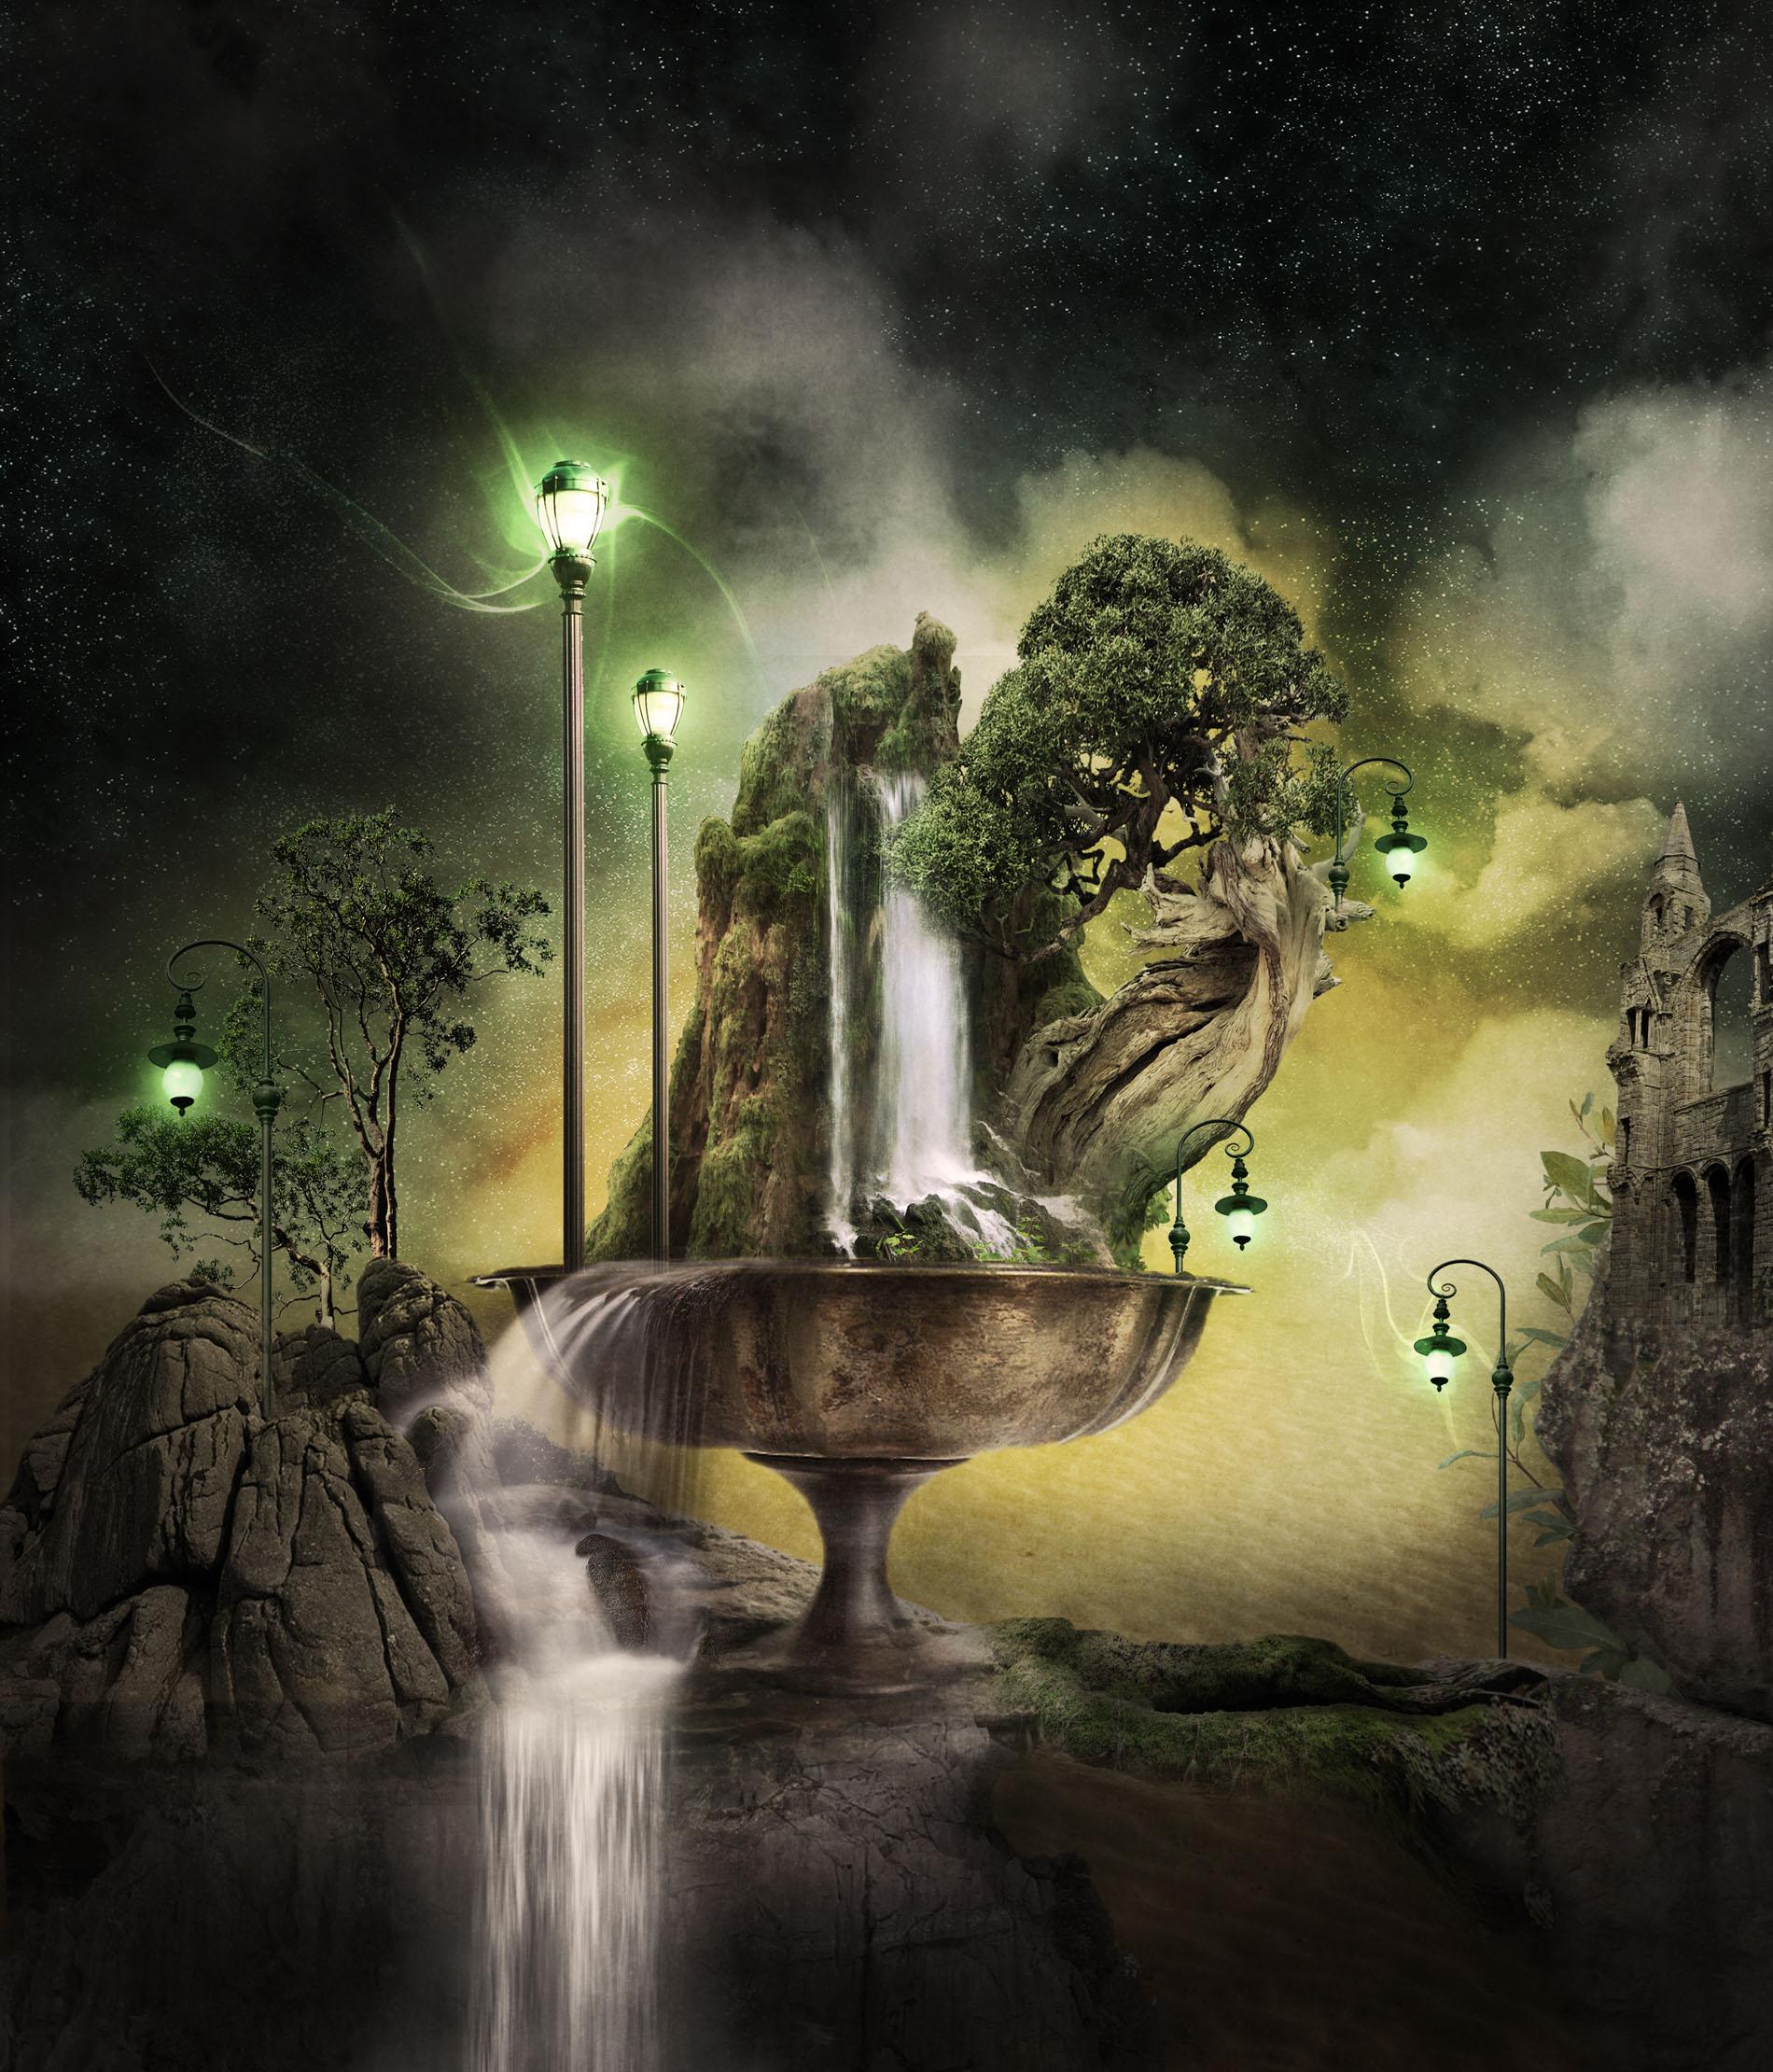 Fantasy Landscape Wallpaper: Concept Art, Scenery